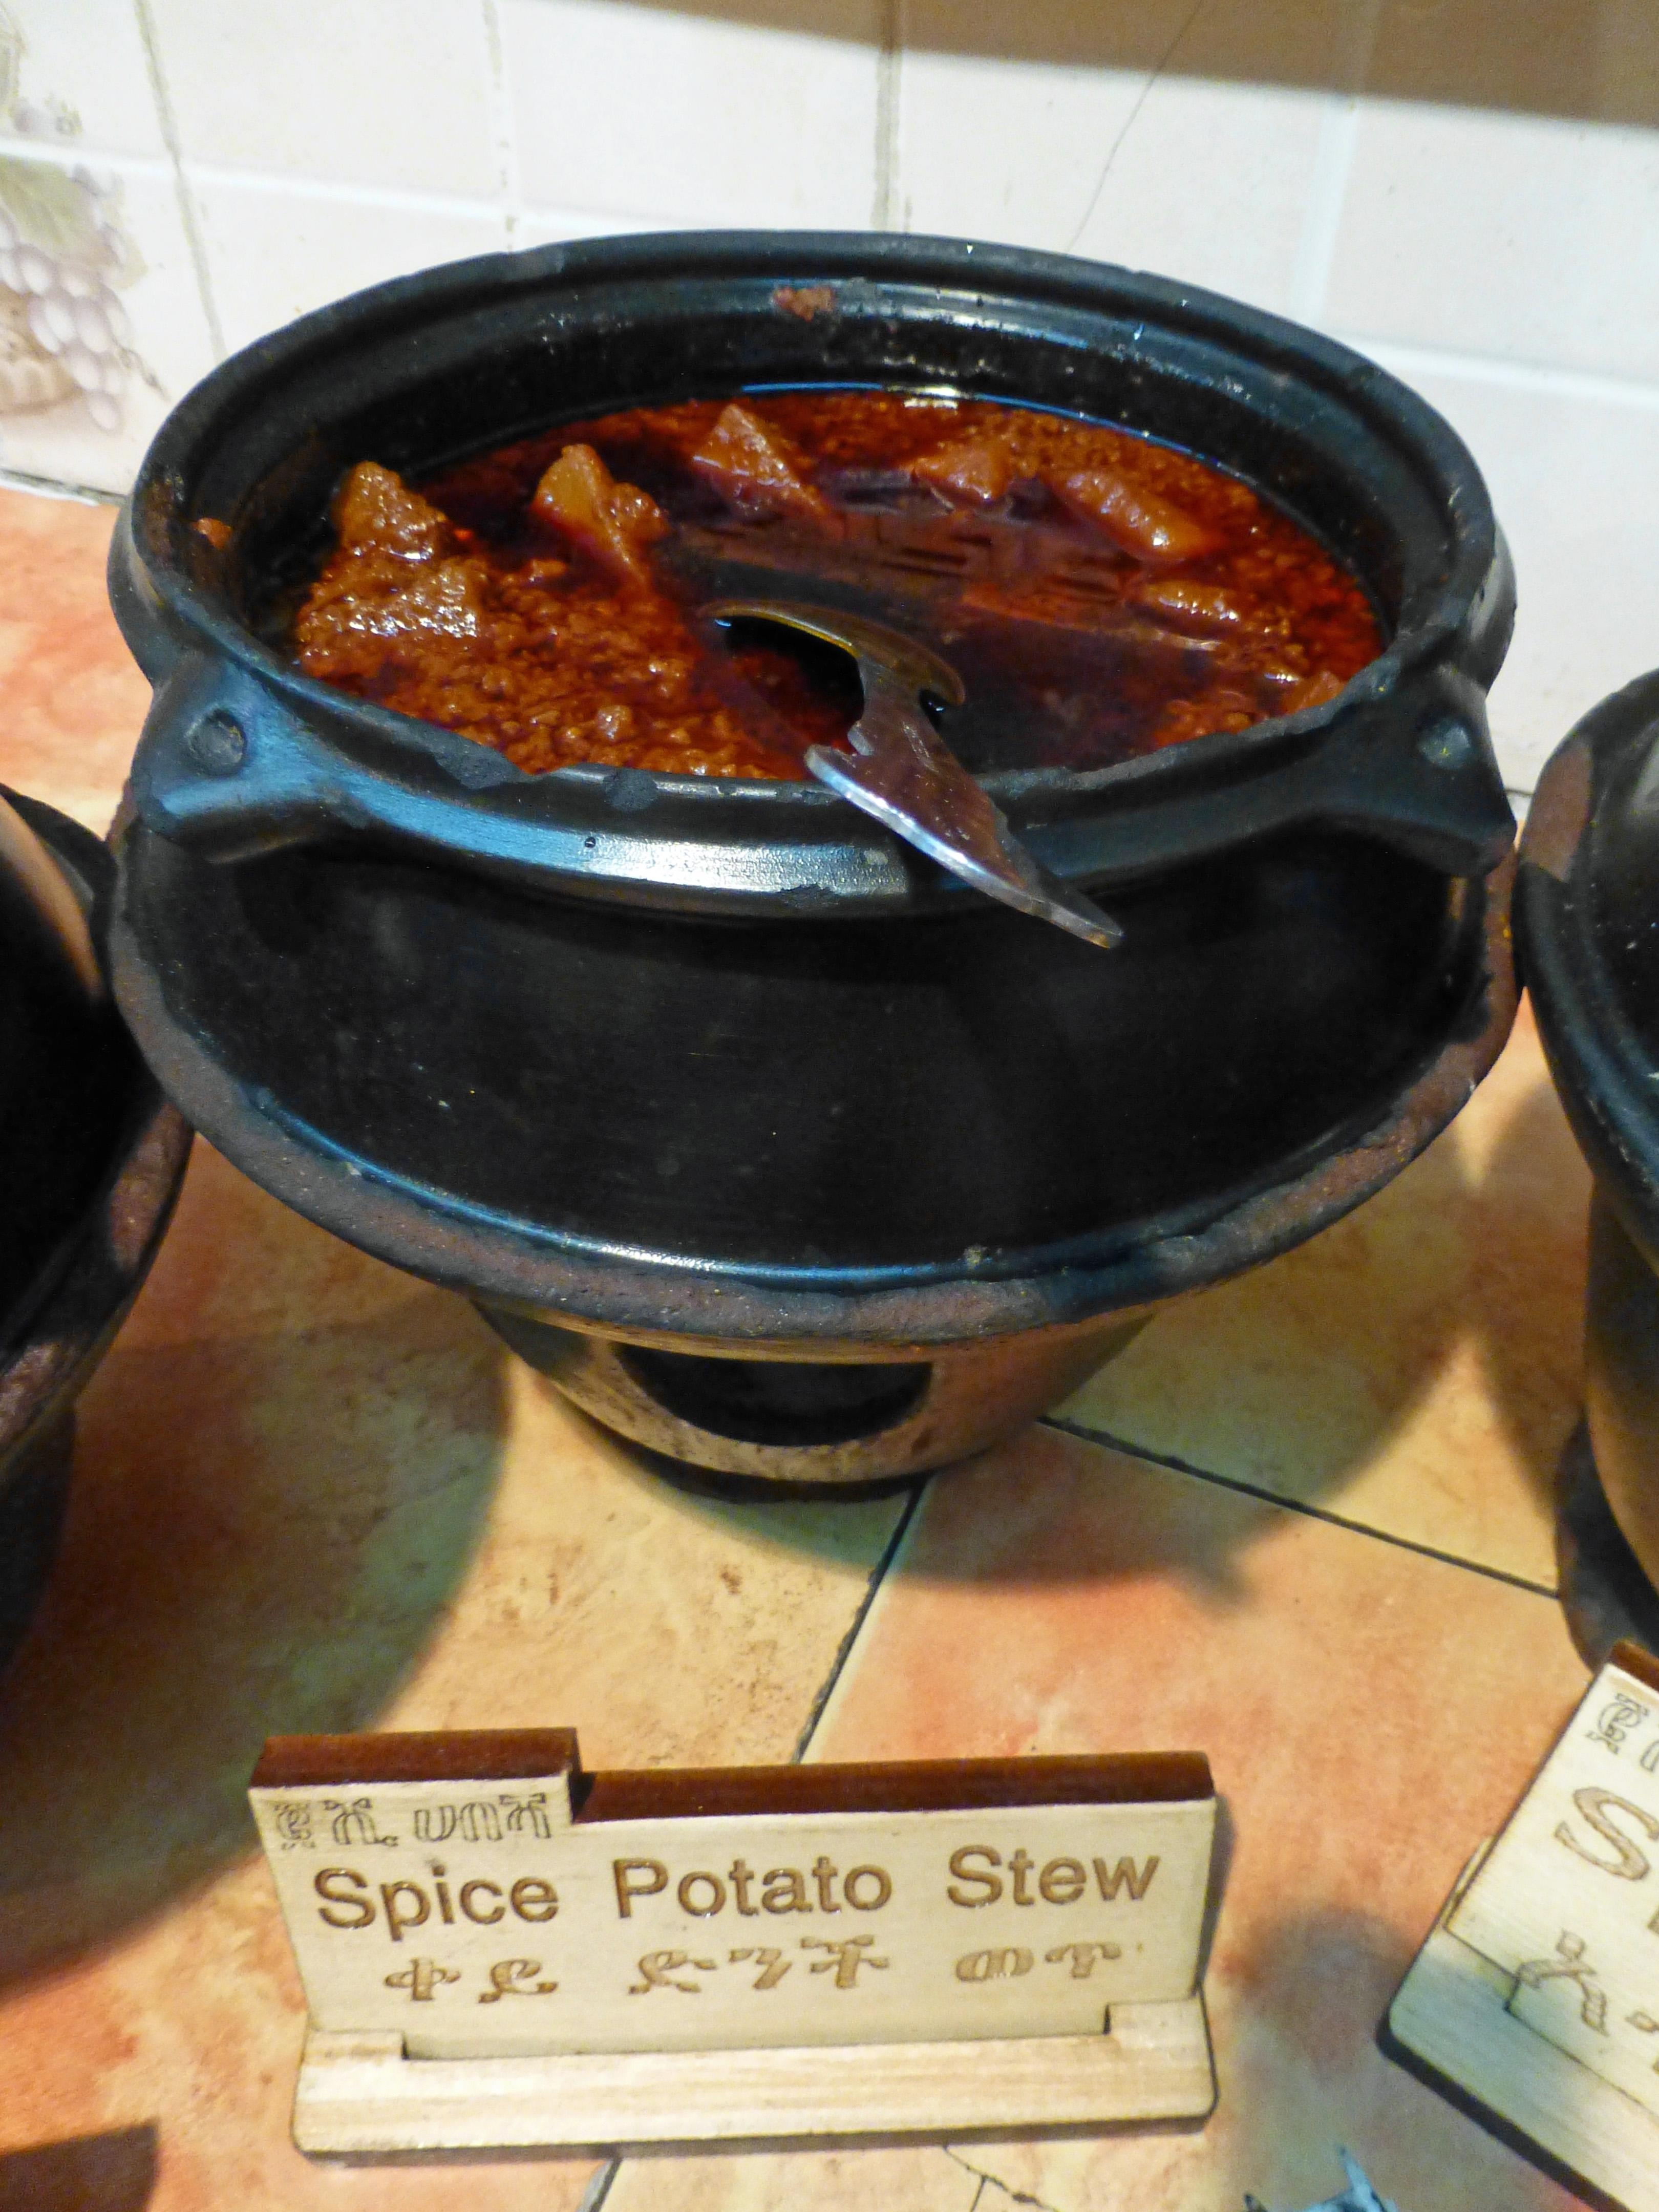 file addis abeba cuisine thiopienne 15 jpg wikimedia commons. Black Bedroom Furniture Sets. Home Design Ideas